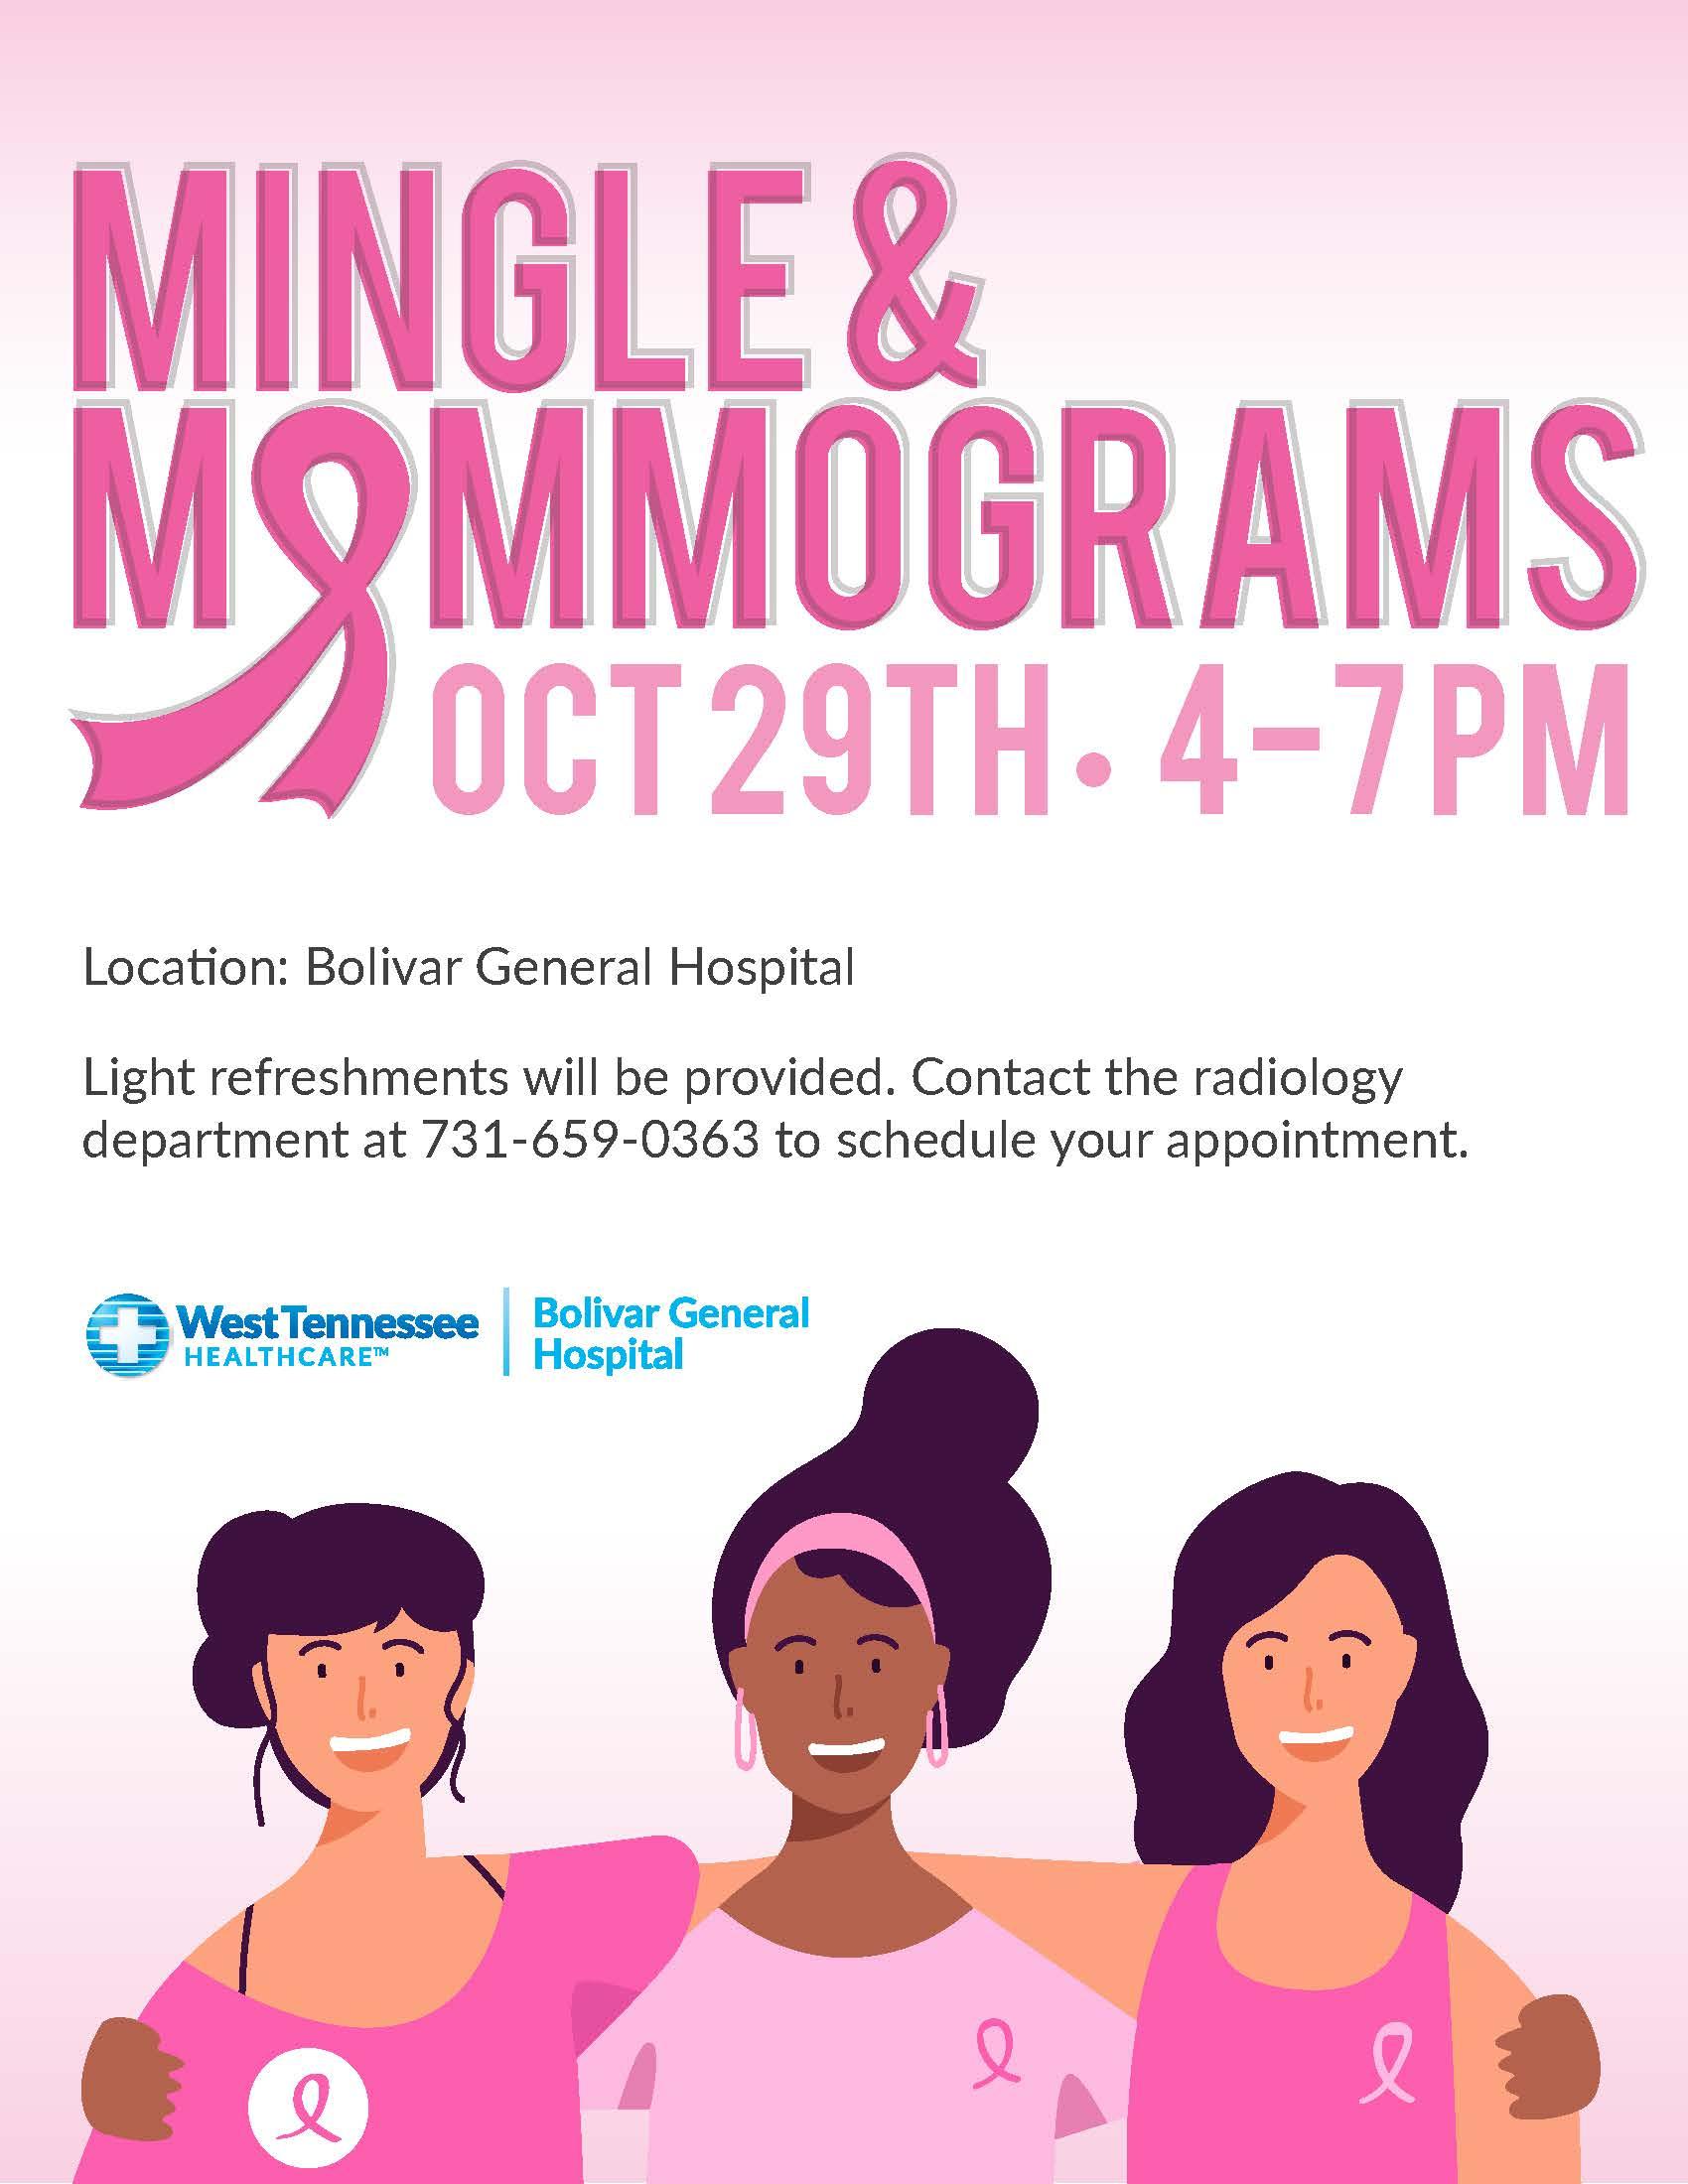 Mingle & Mammograms